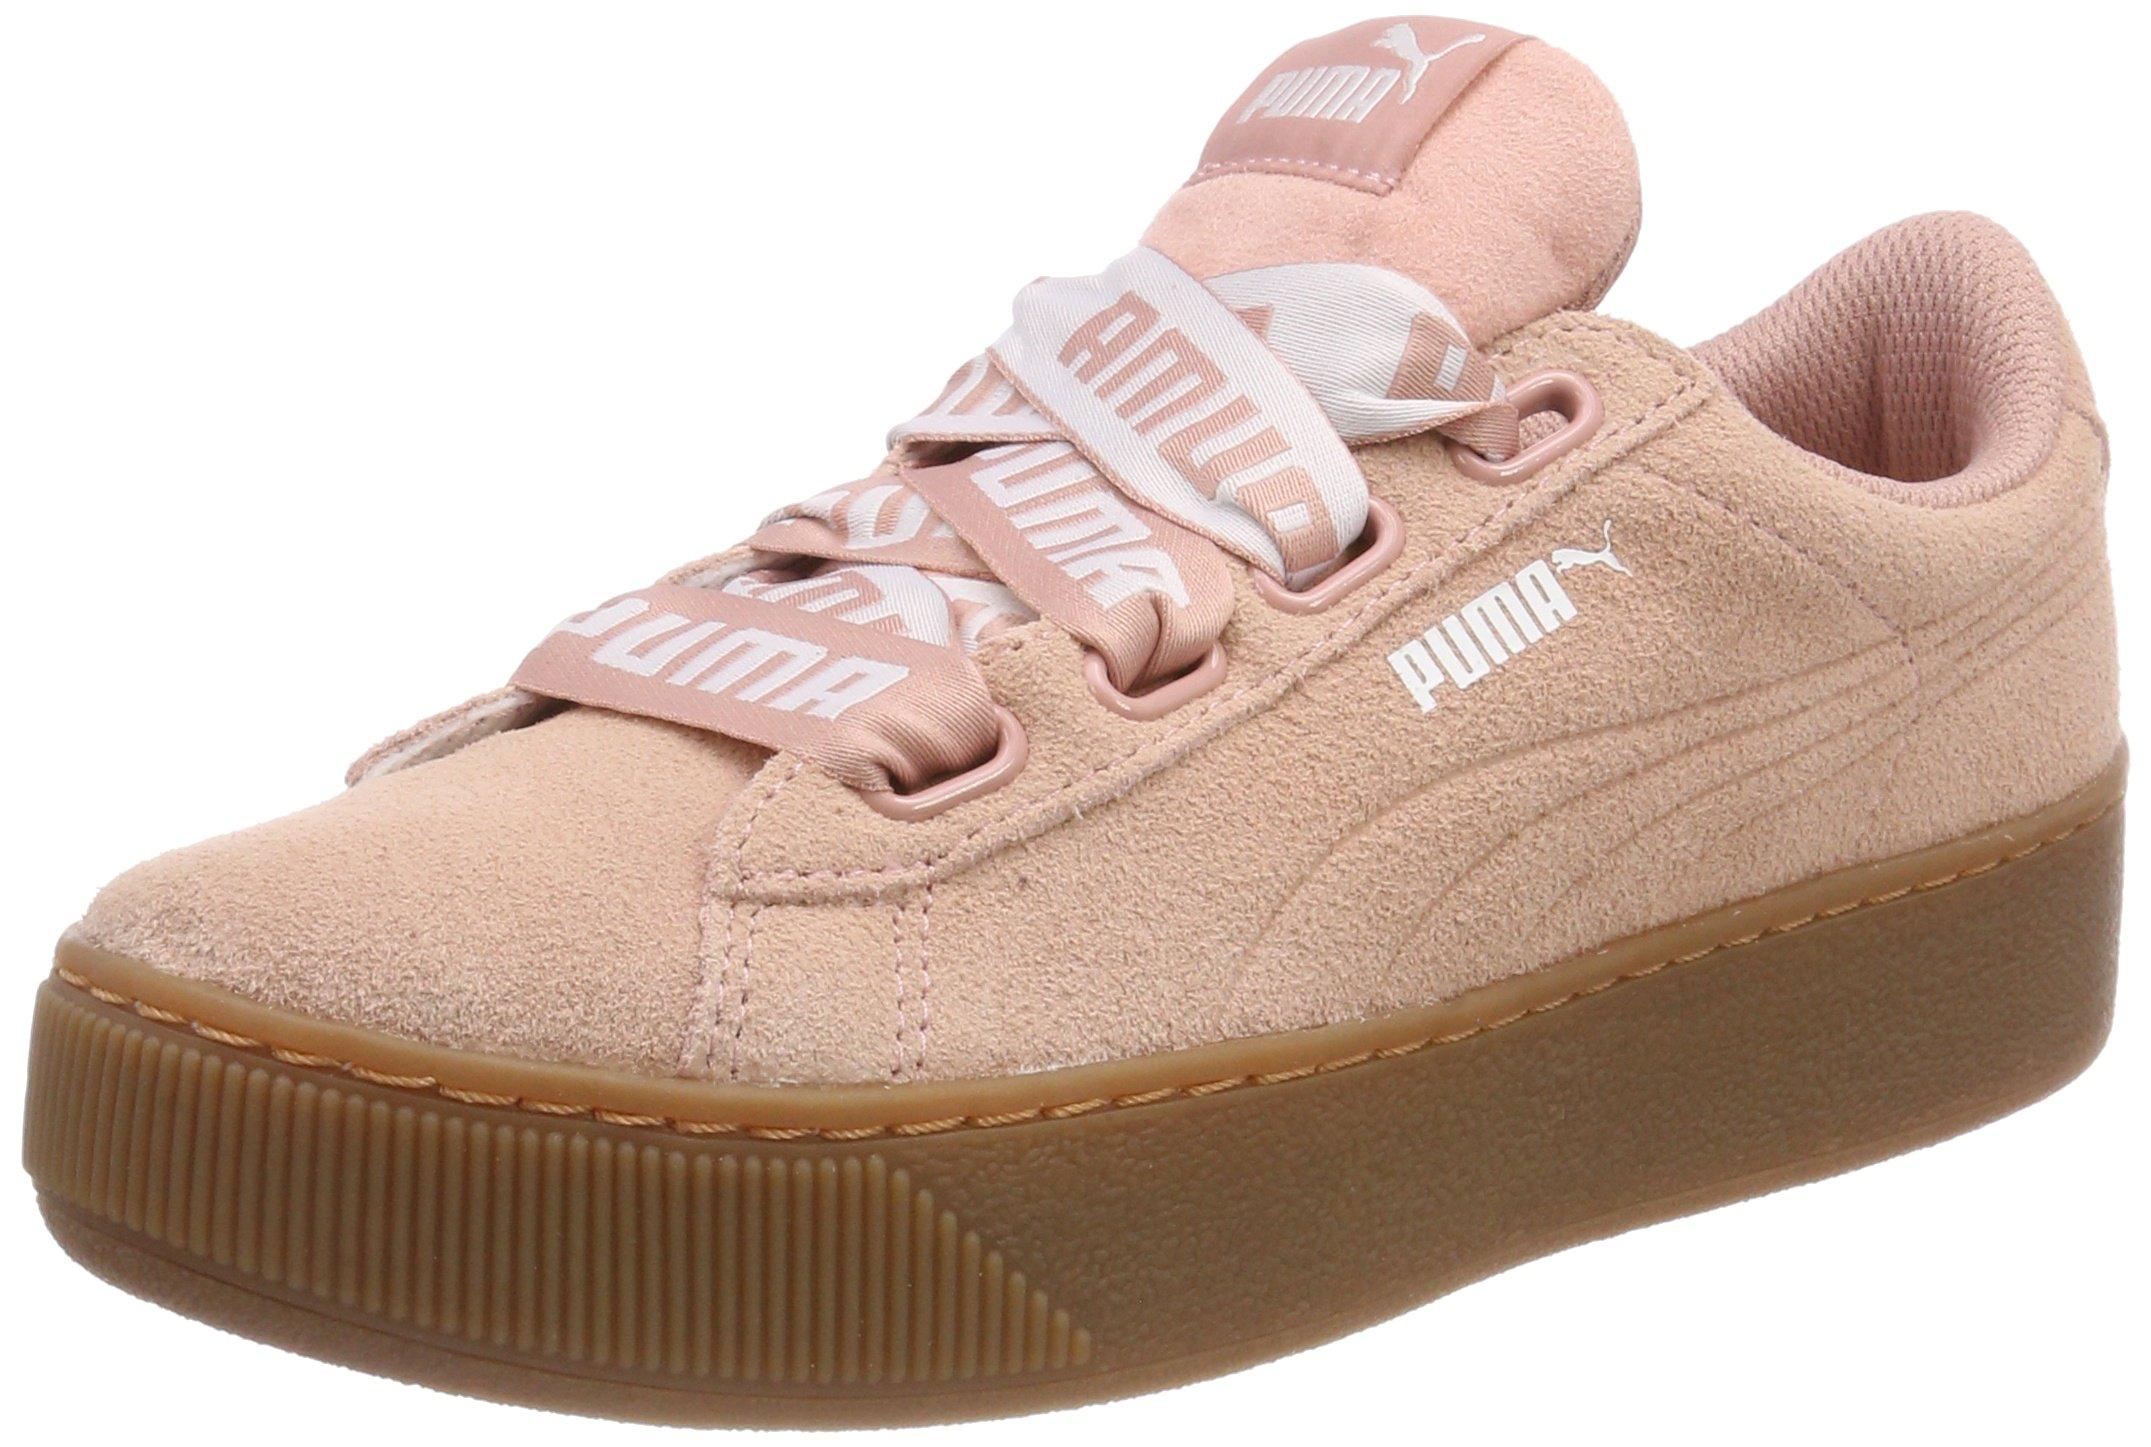 Vikky Platform Basses Beige Bold Ribbon Peach Femme Sneakers Puma pqxCH161